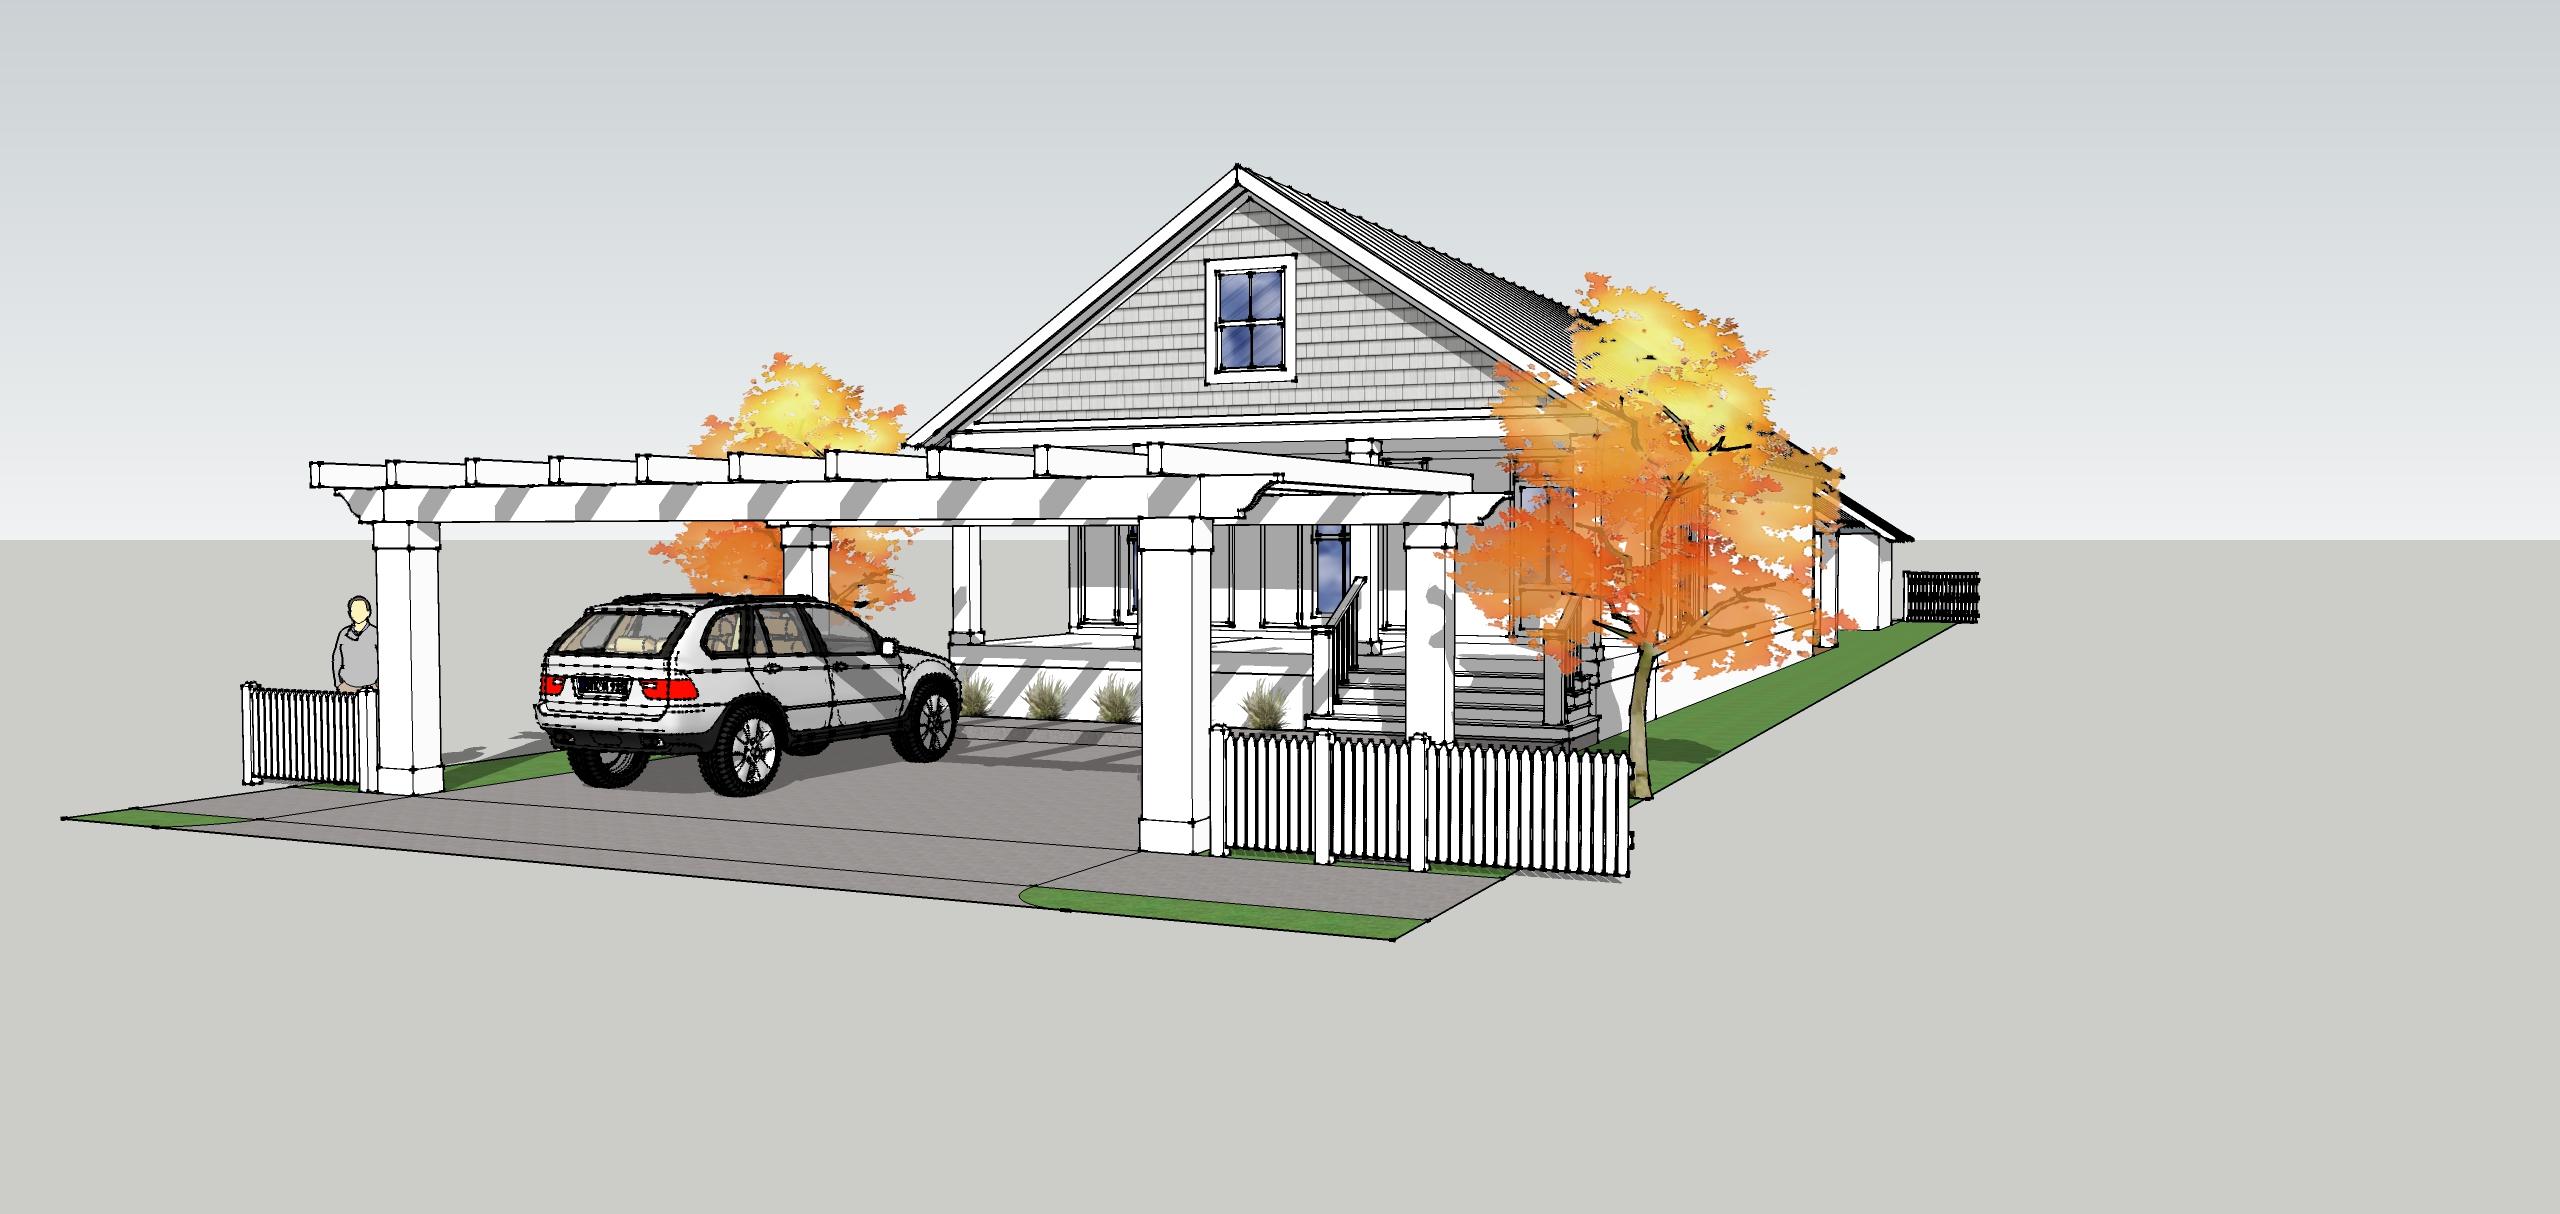 Starkville Station Cottages